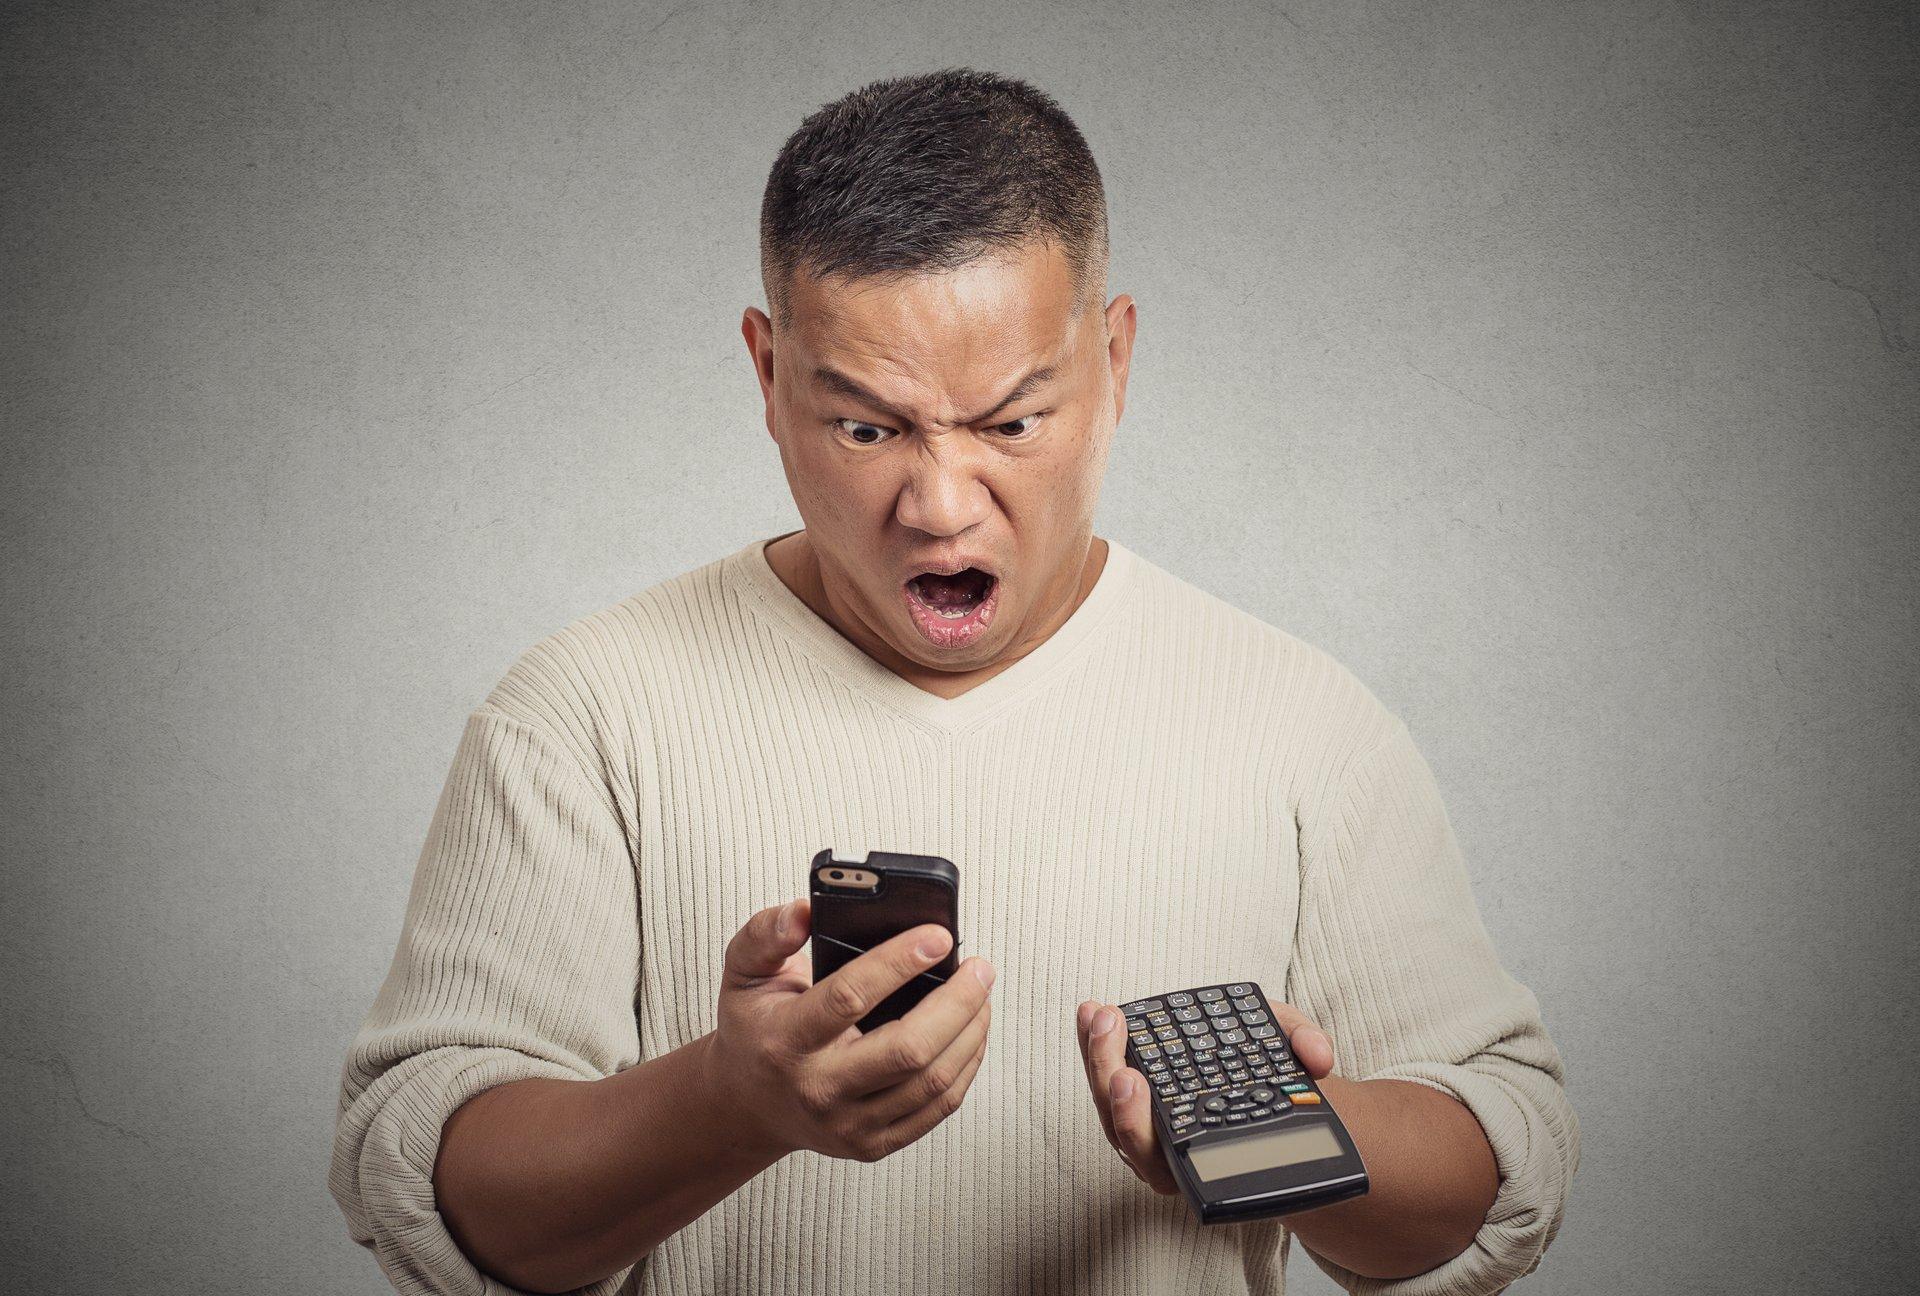 Cell Phone Sticker Shock